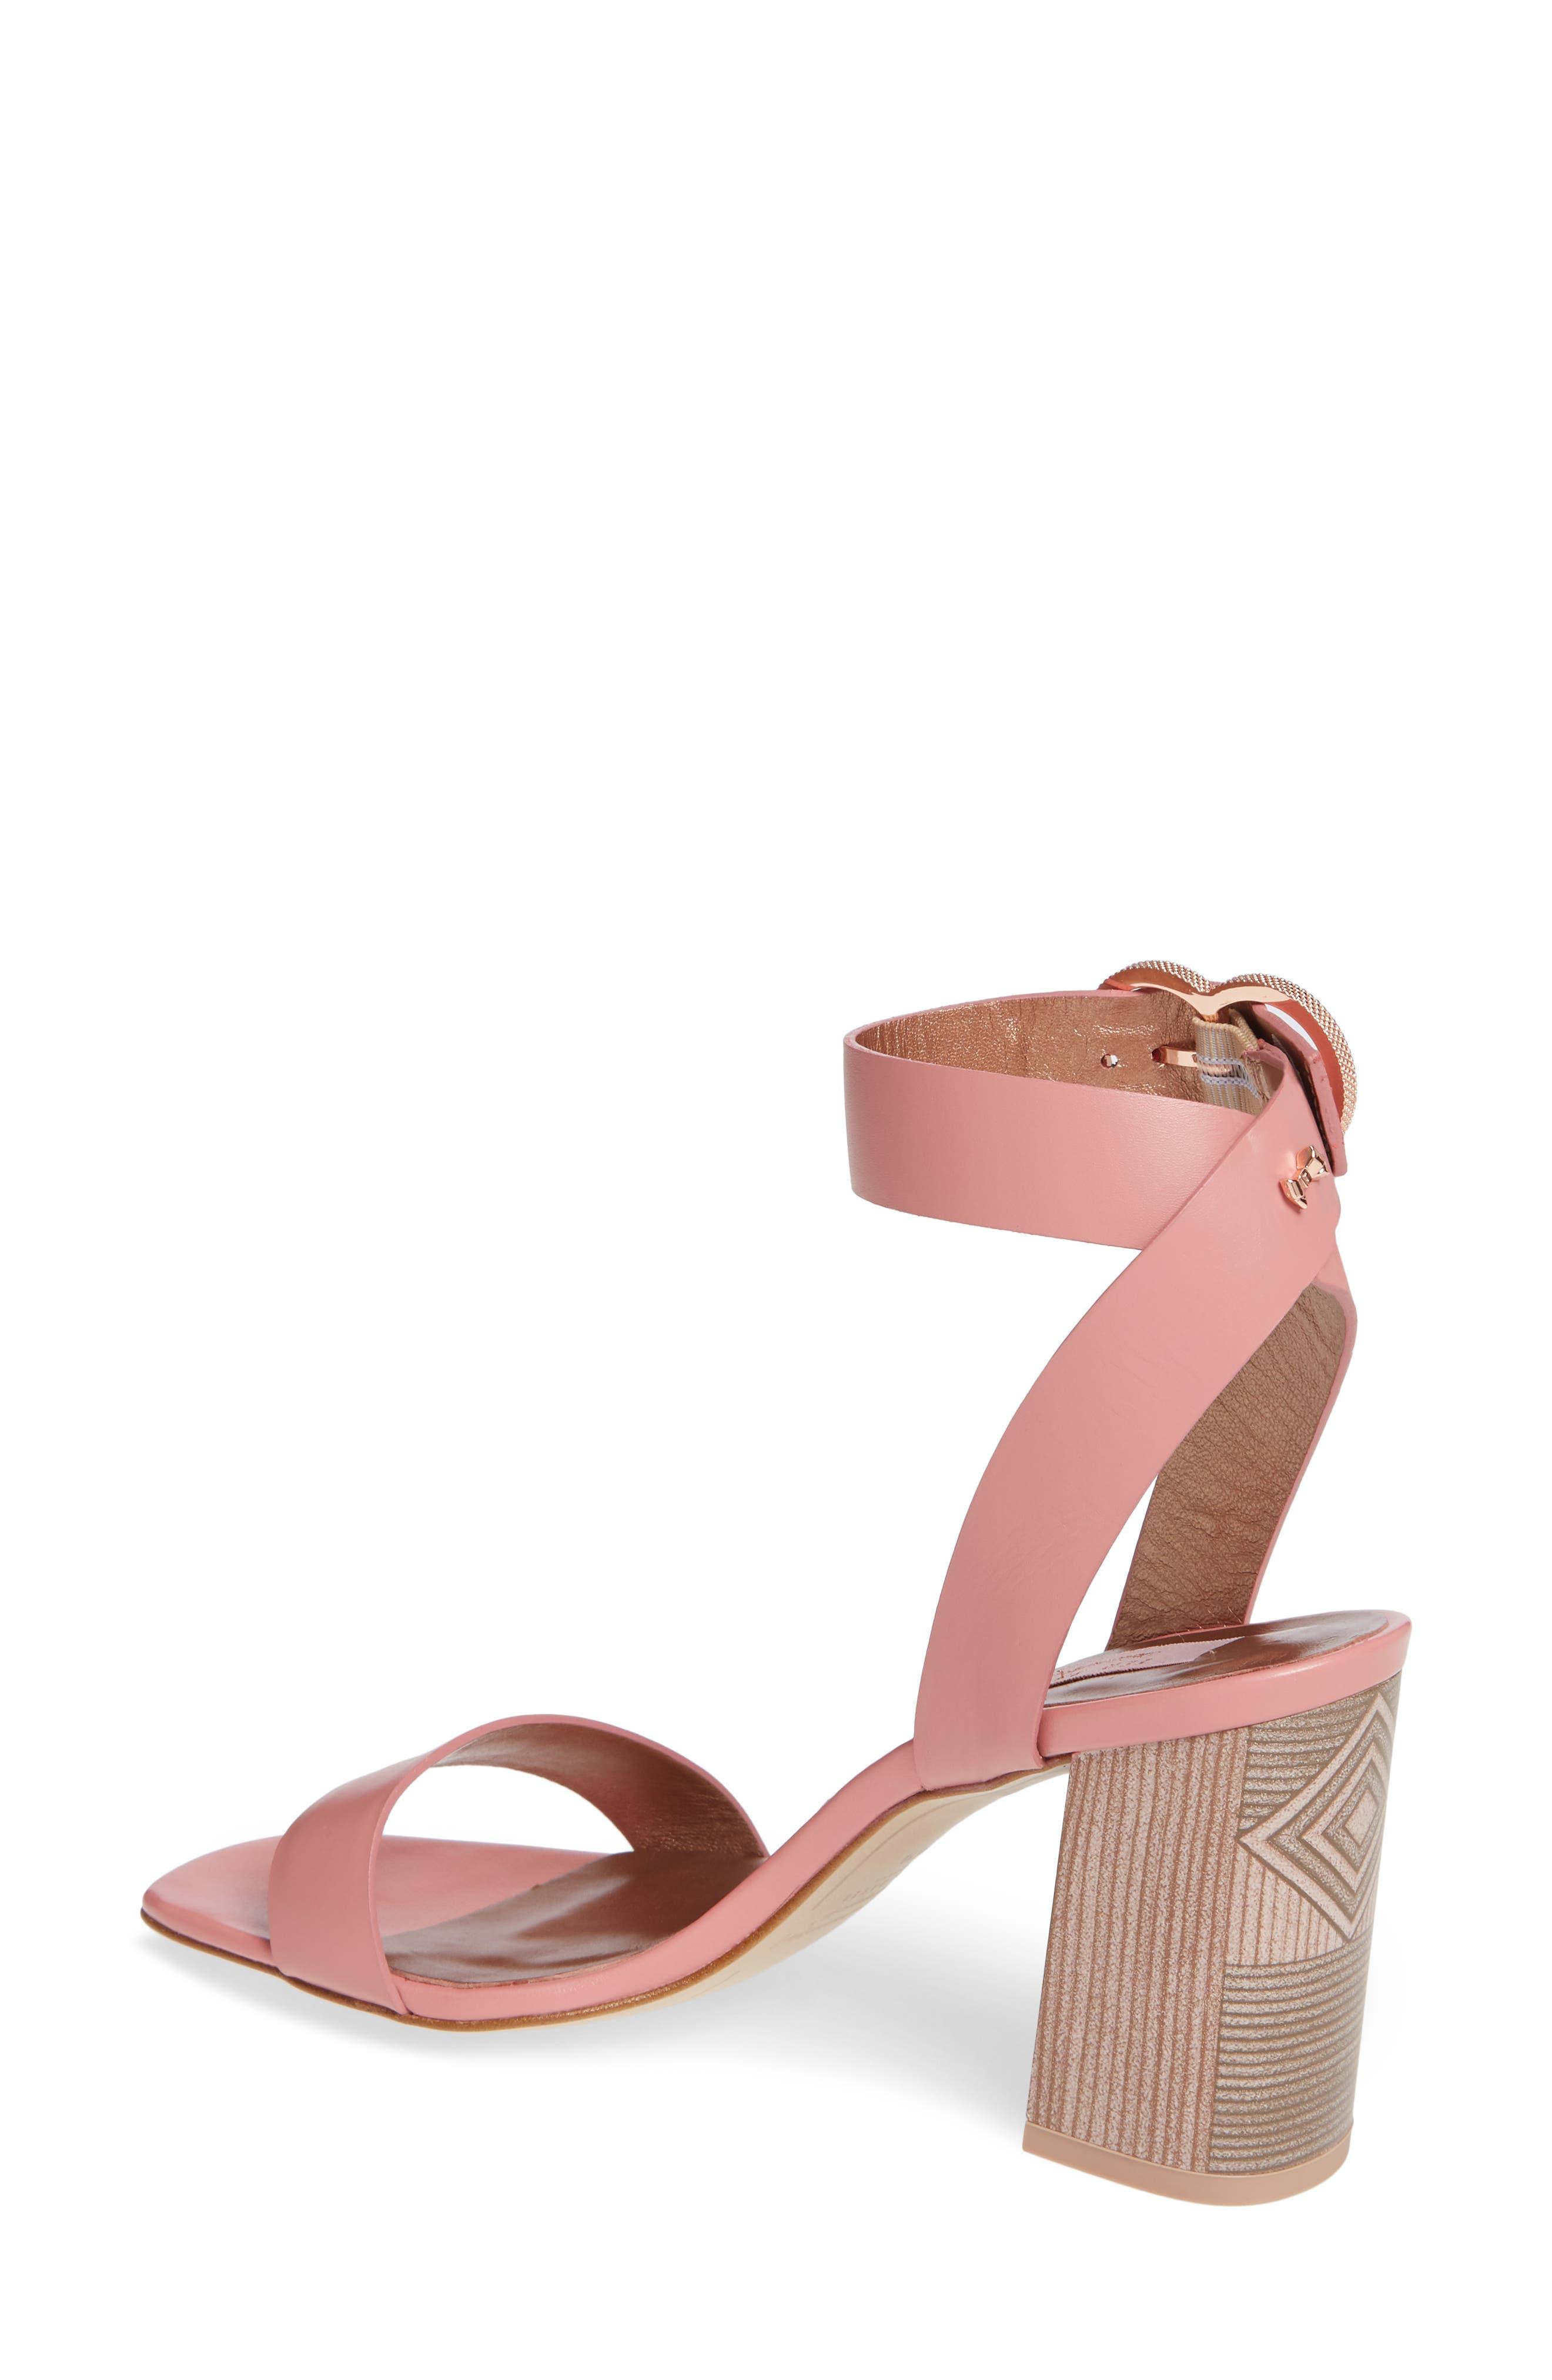 Vallama Block Heel Sandal,                             Alternate thumbnail 2, color,                             PINK LEATHER